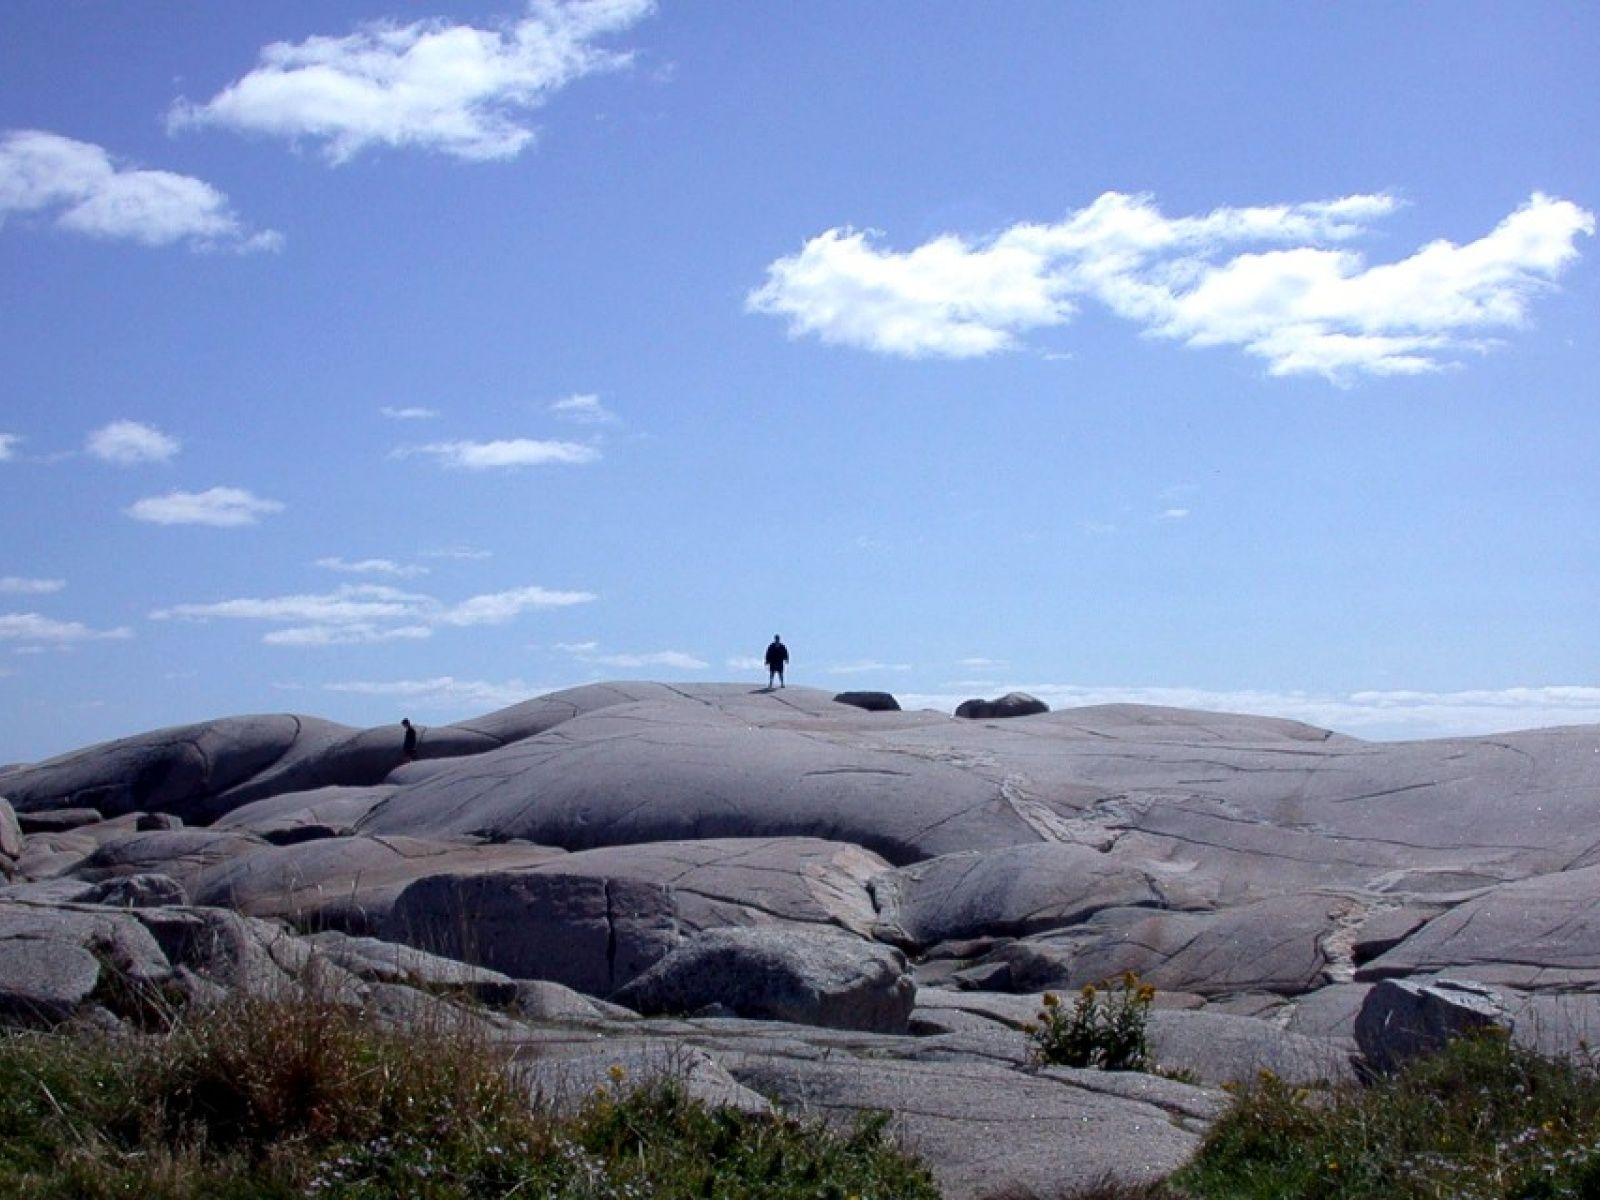 Big Rocks WallpapersNova Scotia Wallpapers Pictures Download 1600x1200